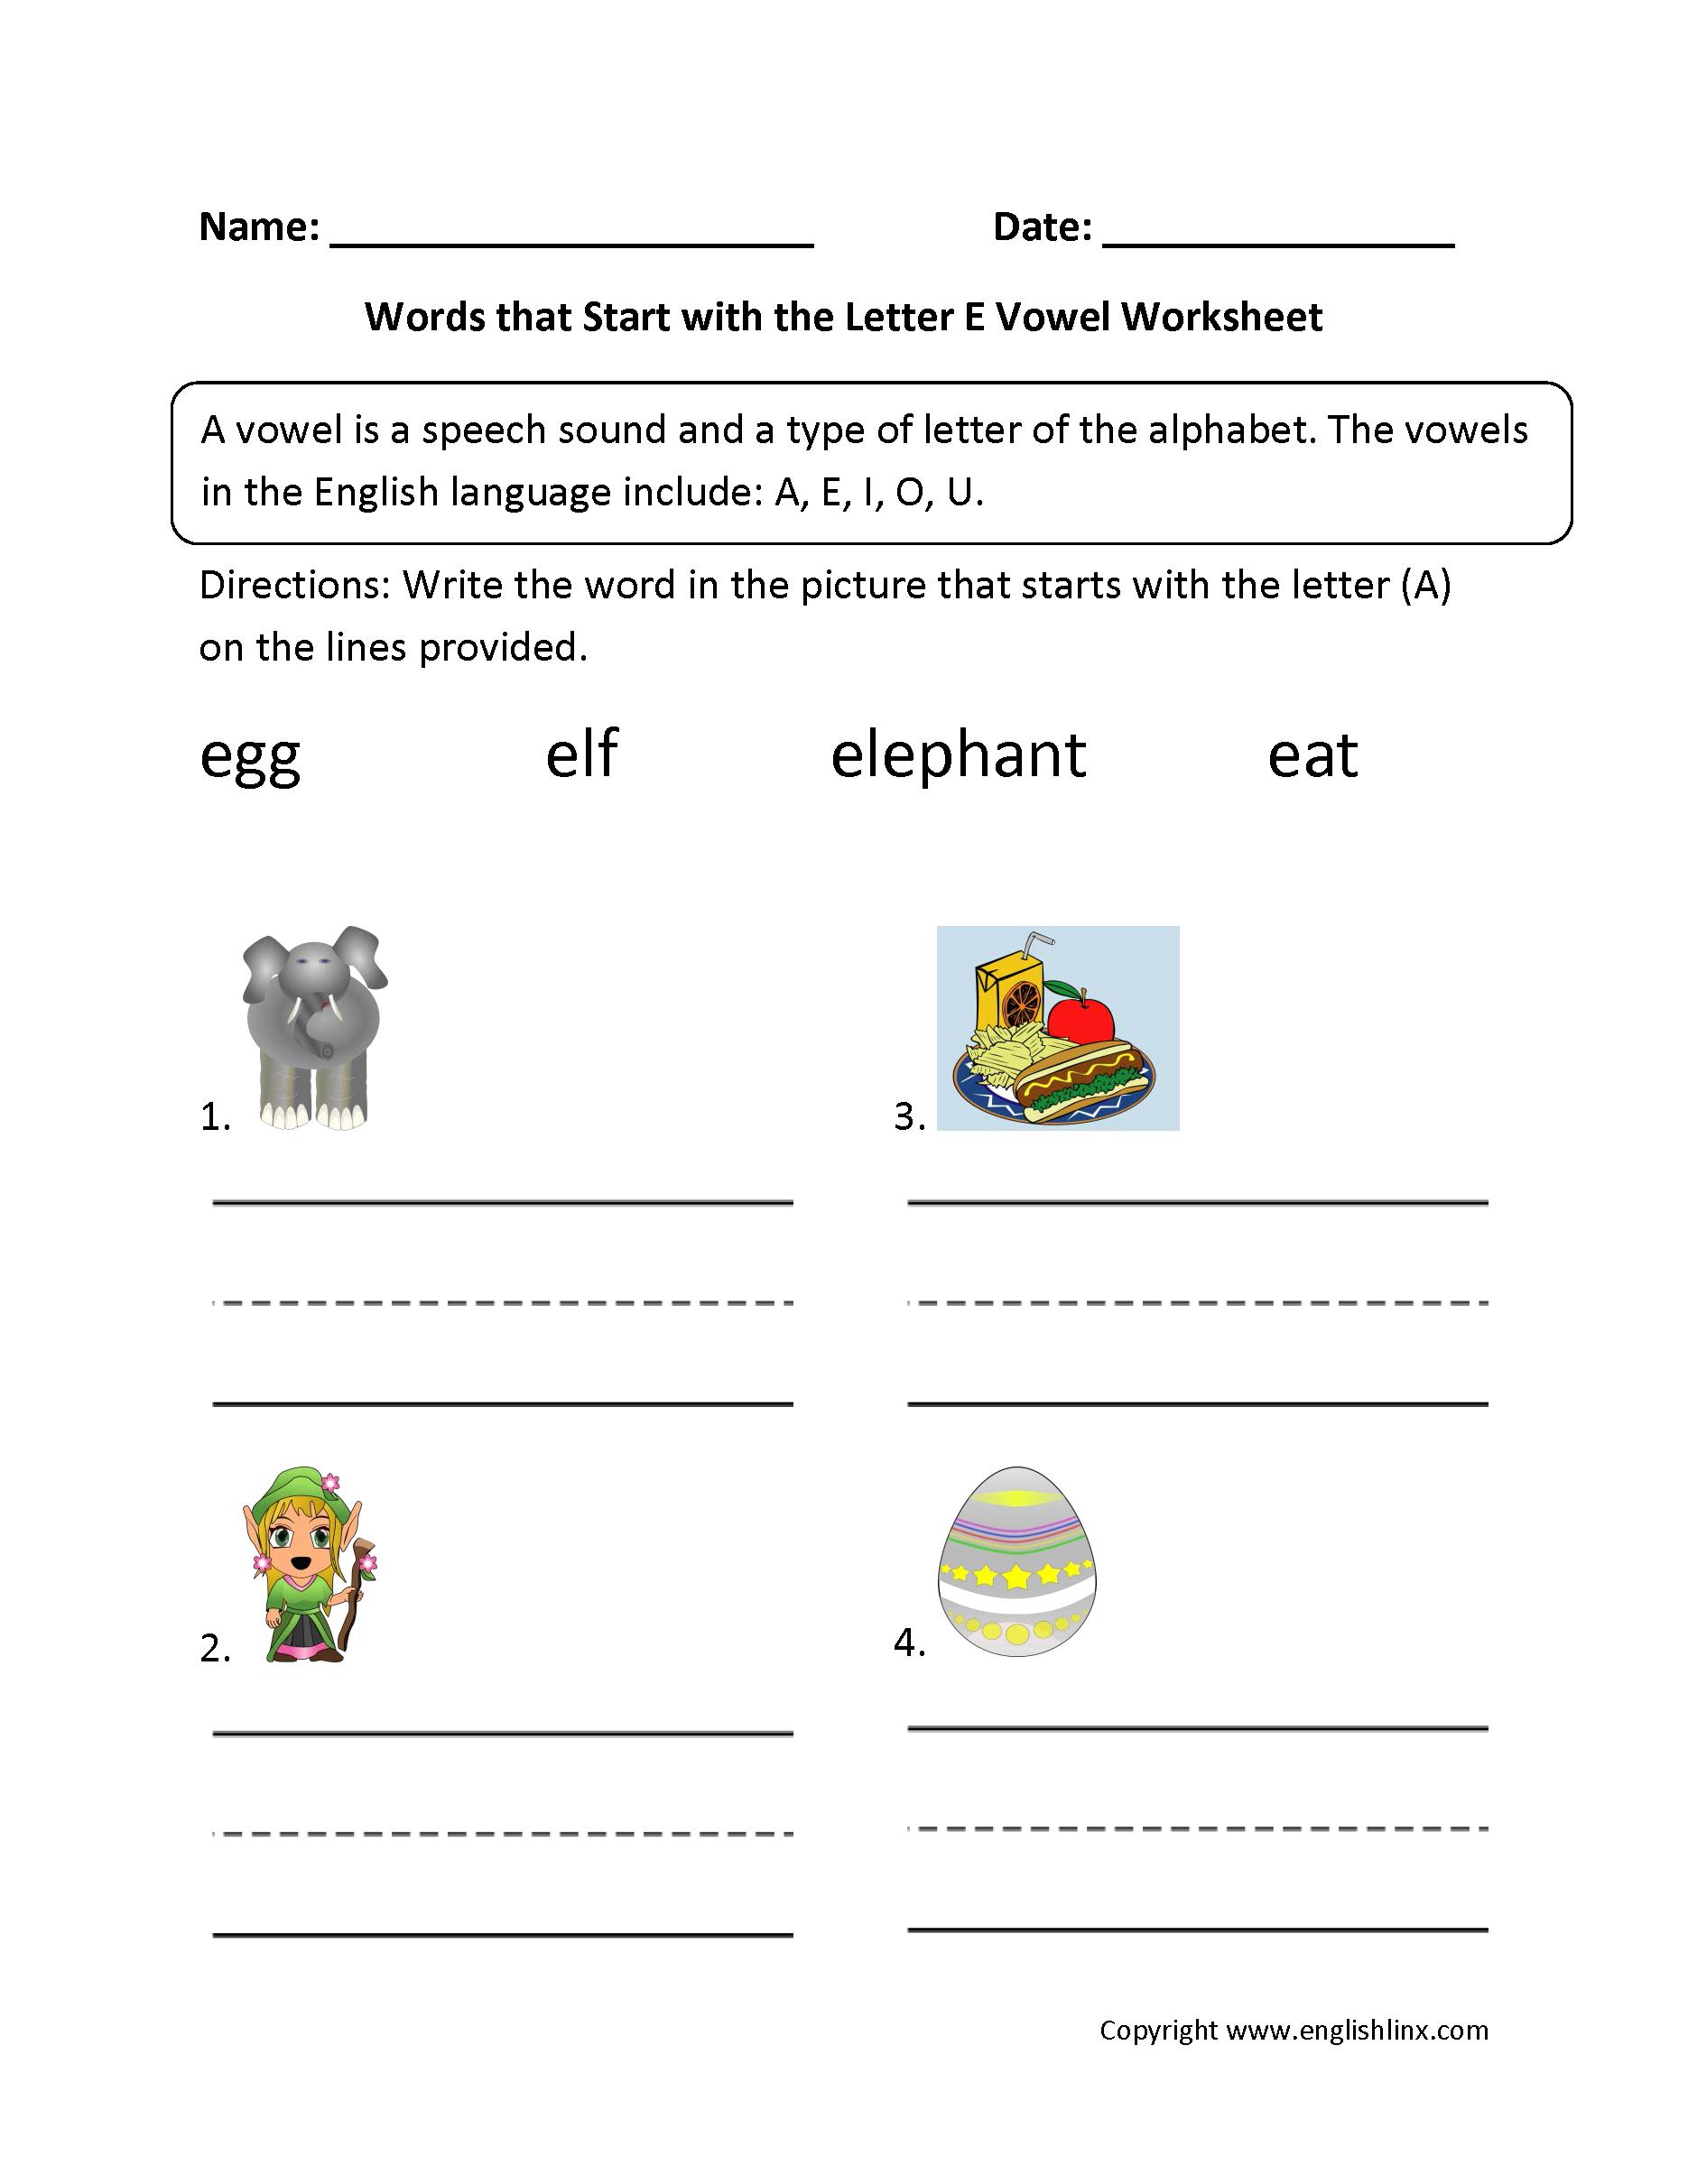 Words Start Letter E Vowel Worksheets